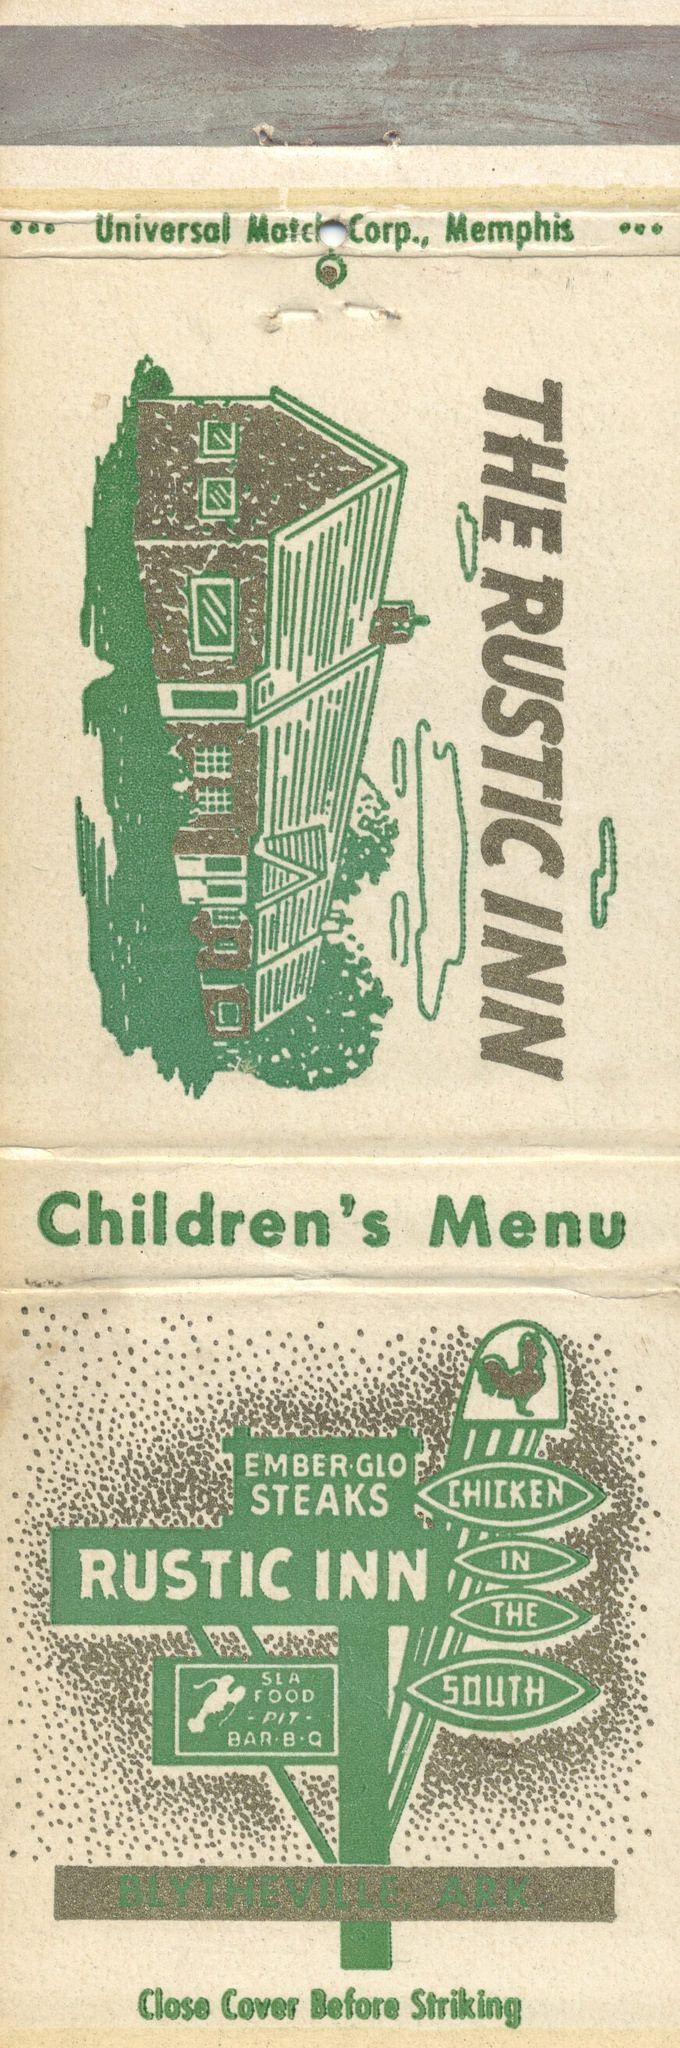 https://flic.kr/p/Le8KAX | The Rustic Inn - Blytheville, Arkansas | Chicken in…